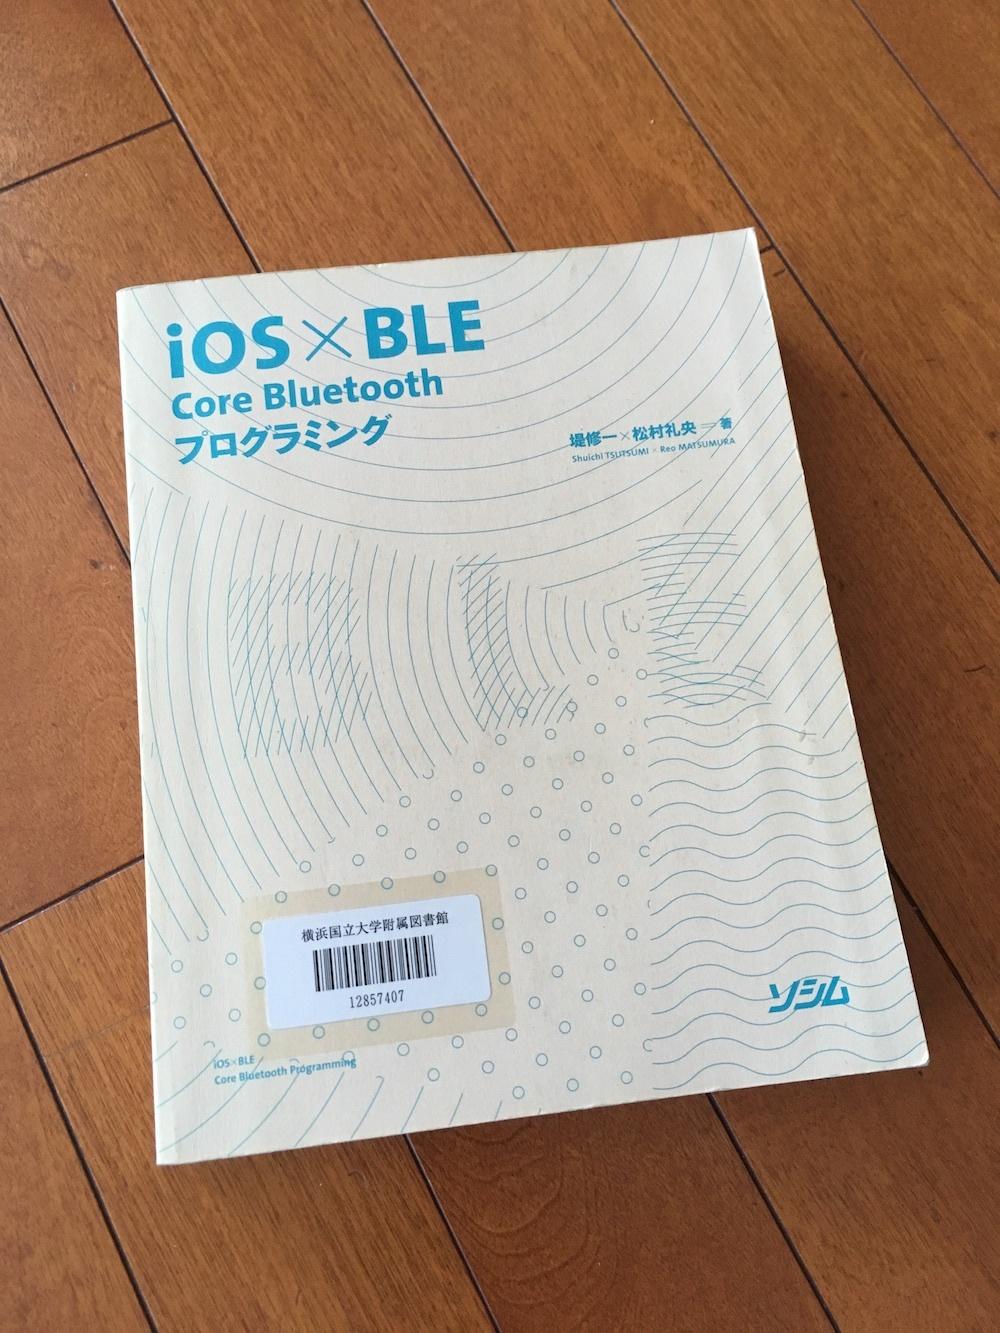 oosxble.jpg